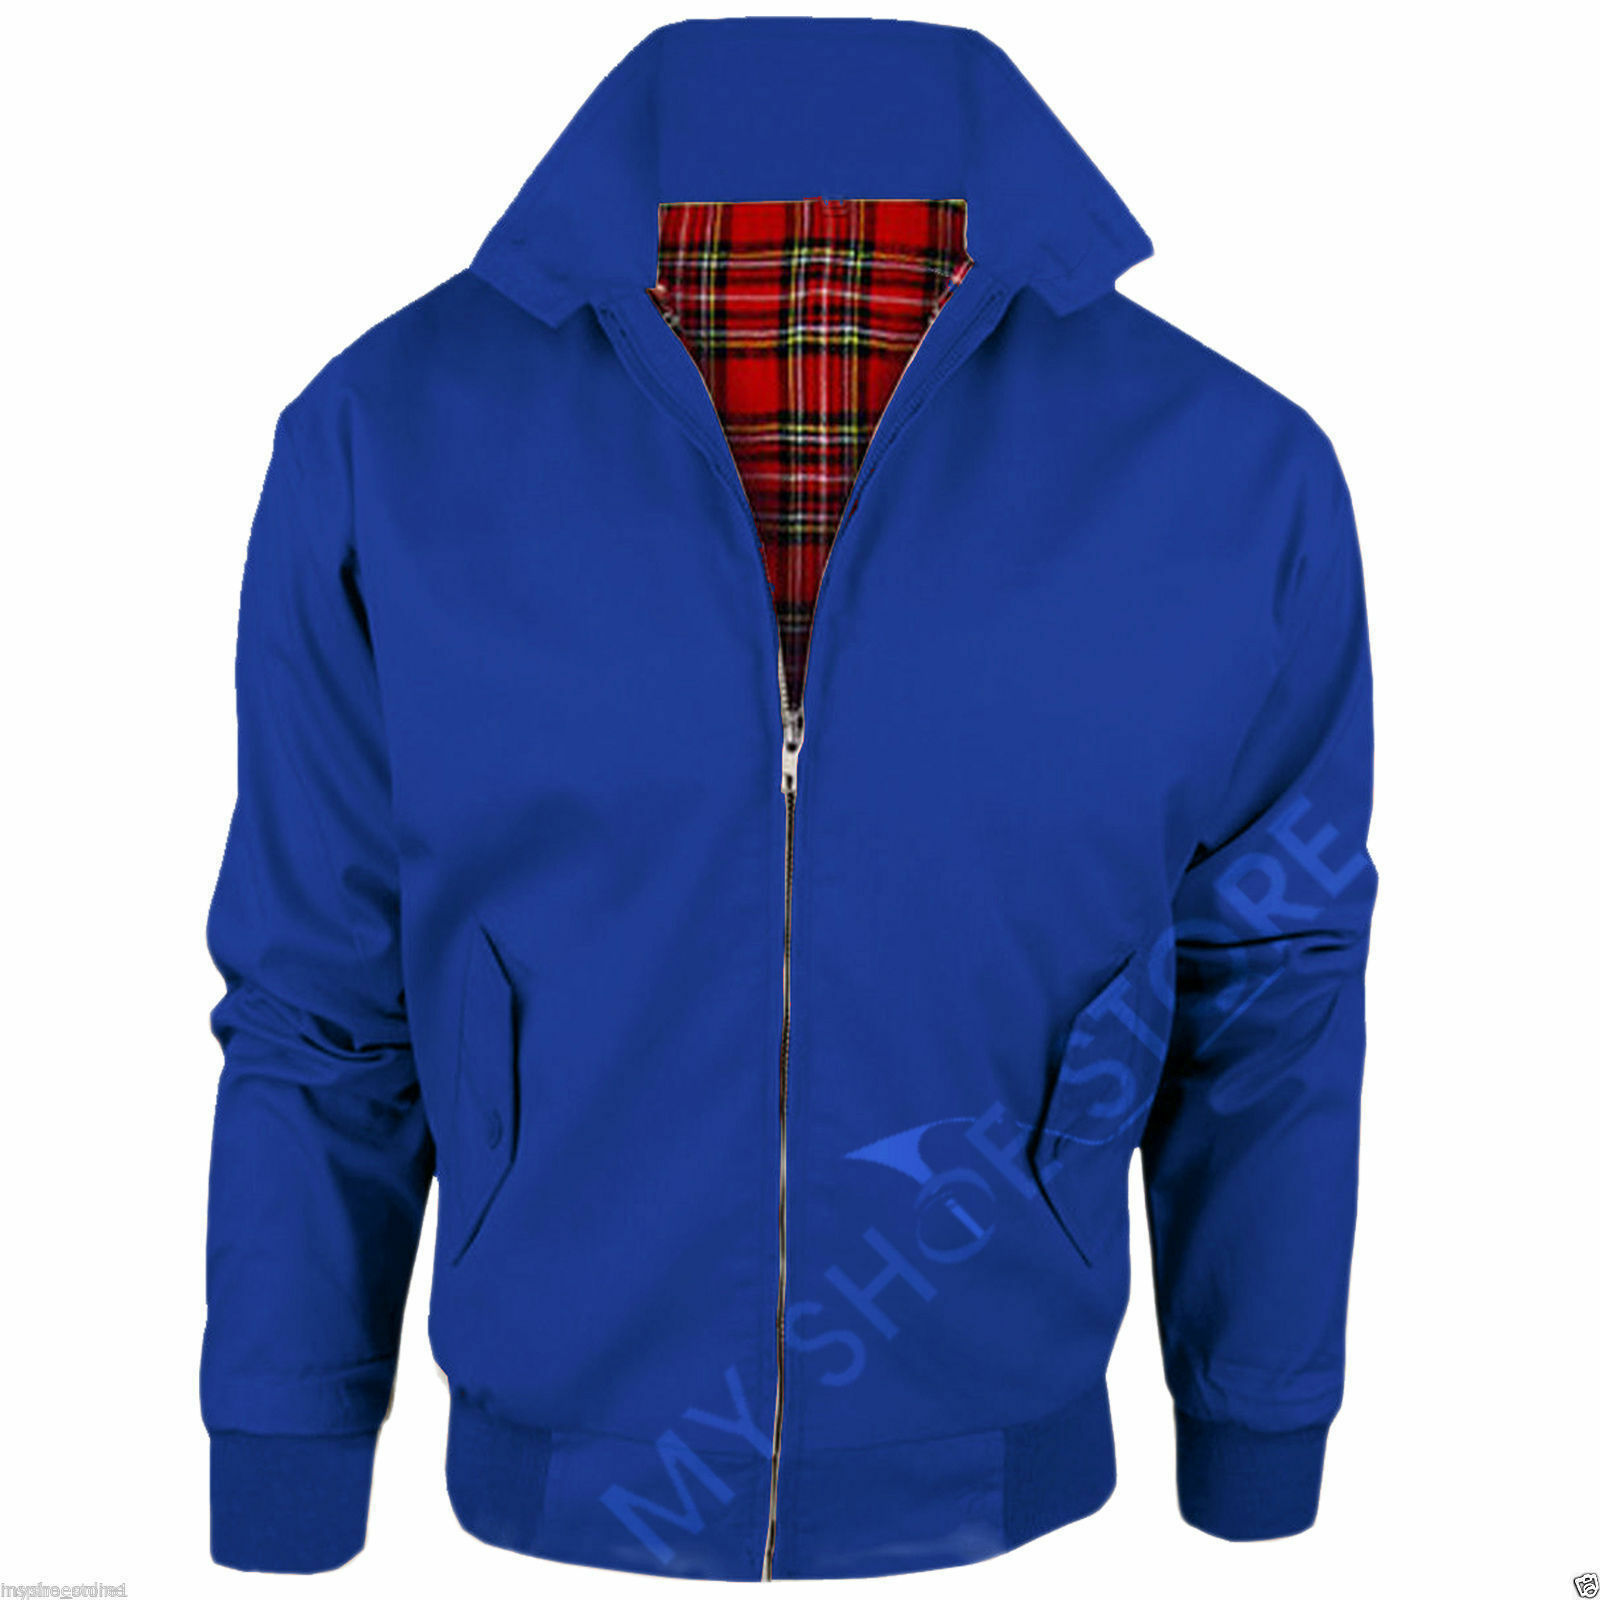 Royal Blue / Harrington Jacket Lightweight Size